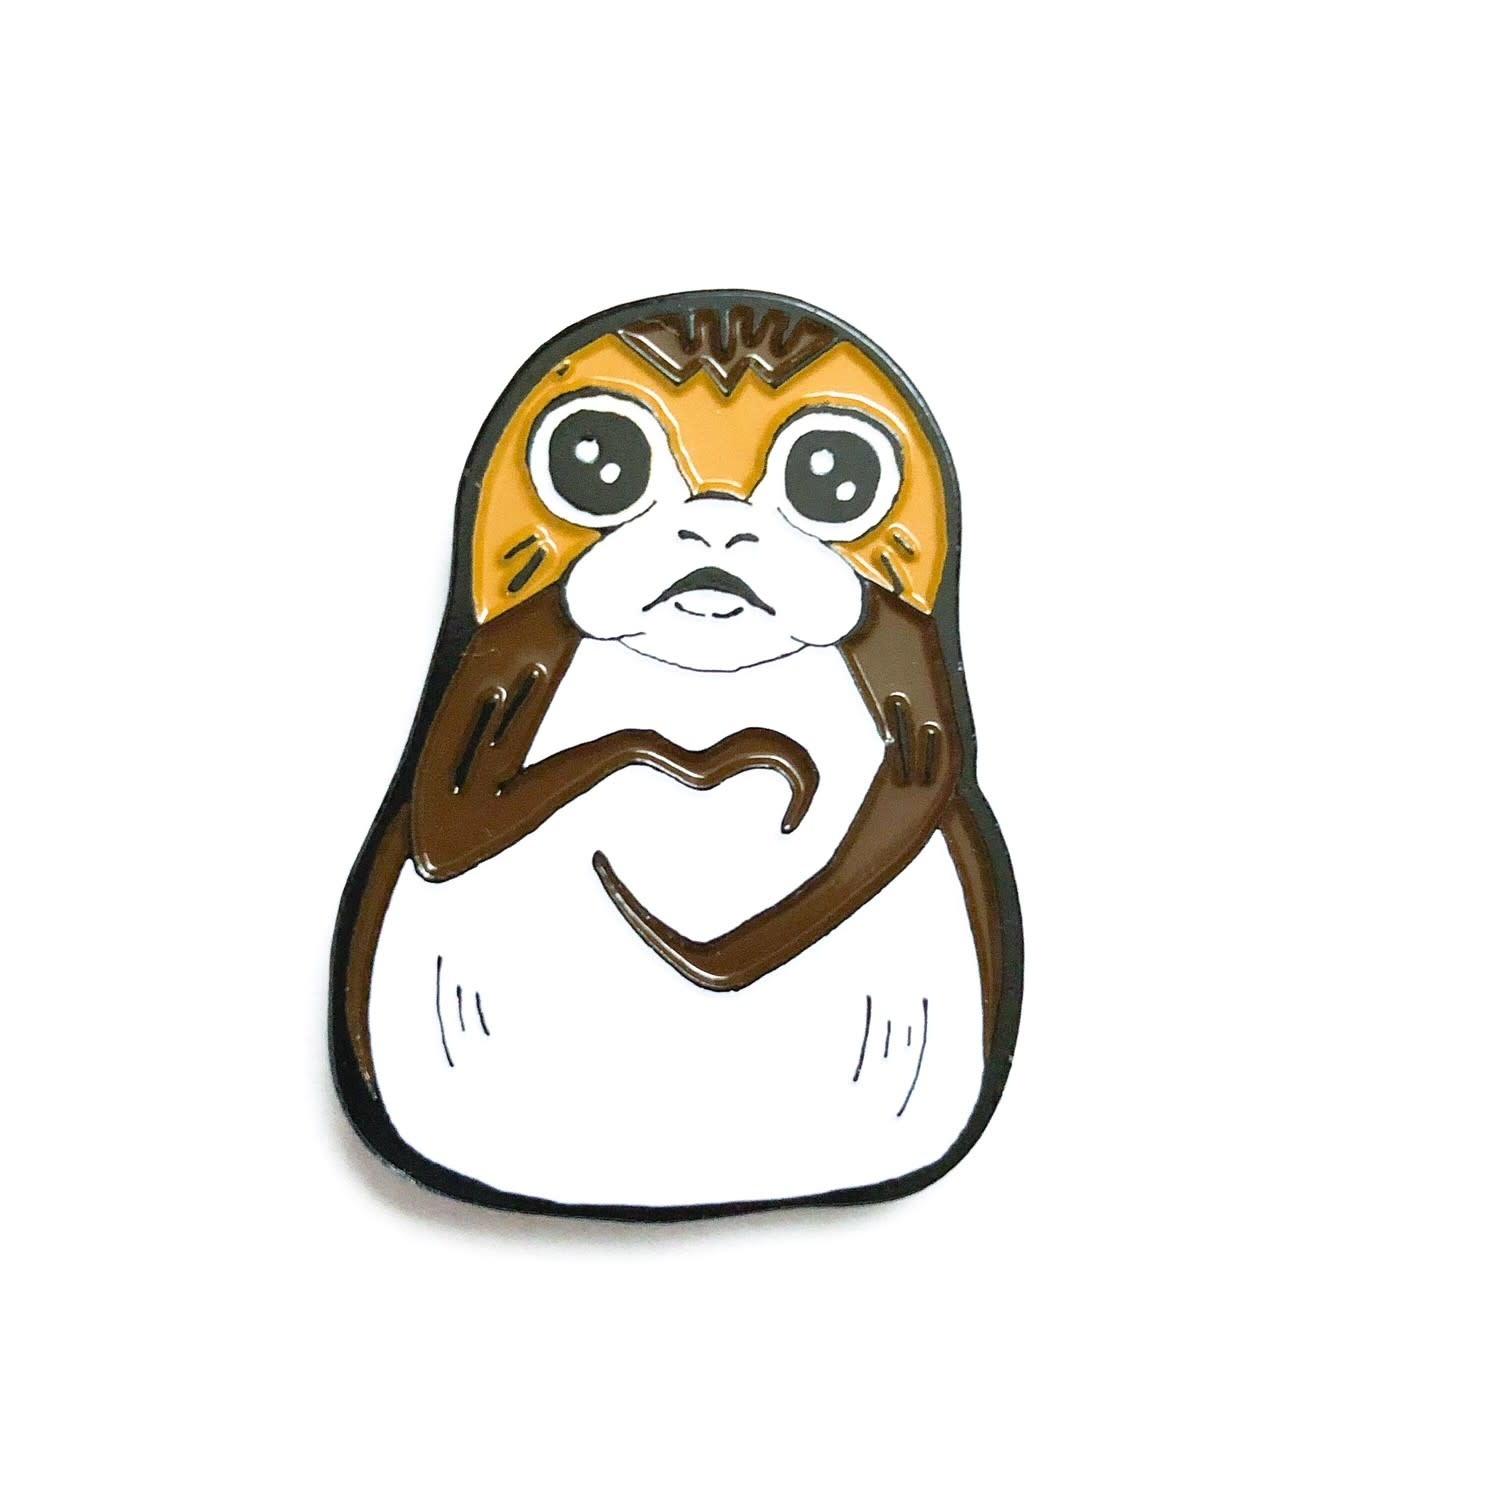 DKE Star Wars: I heart U - Porg Pin